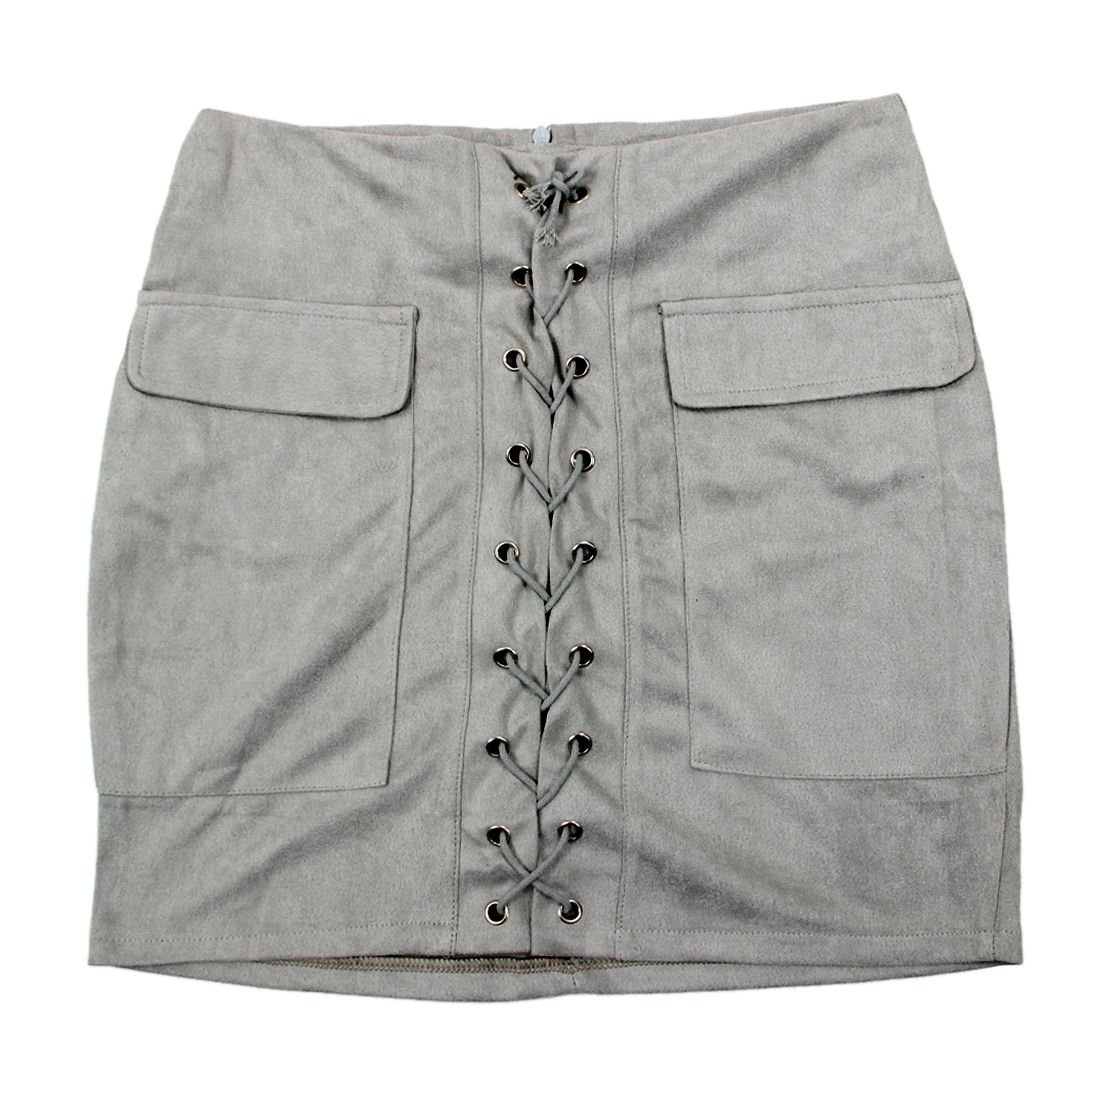 9687c146f Womens Lace Up Skirts – DACC